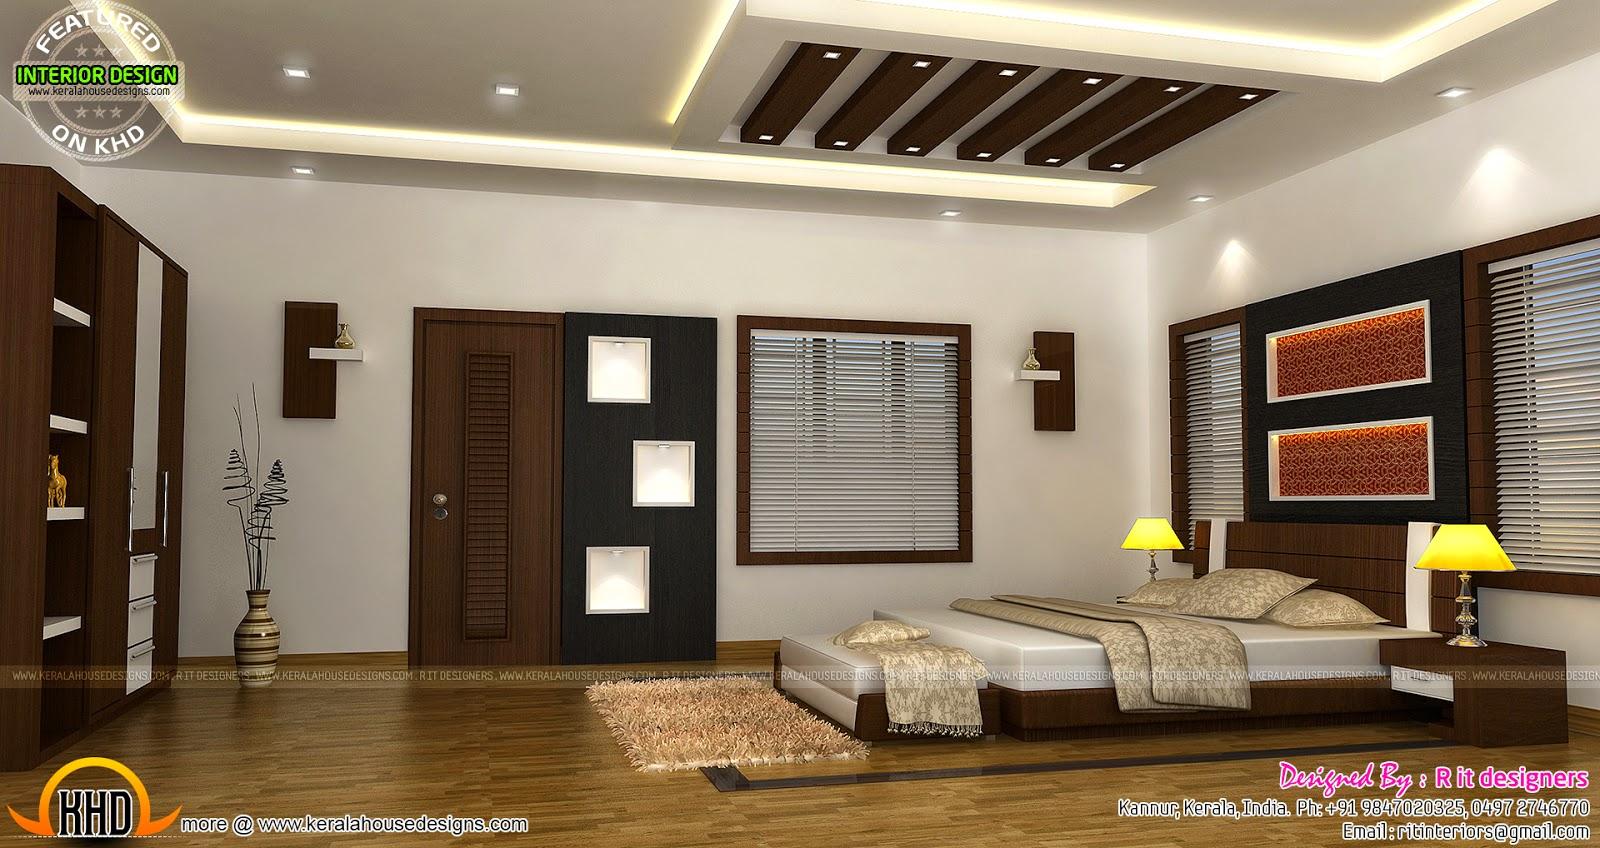 Bedroom interior design with cost